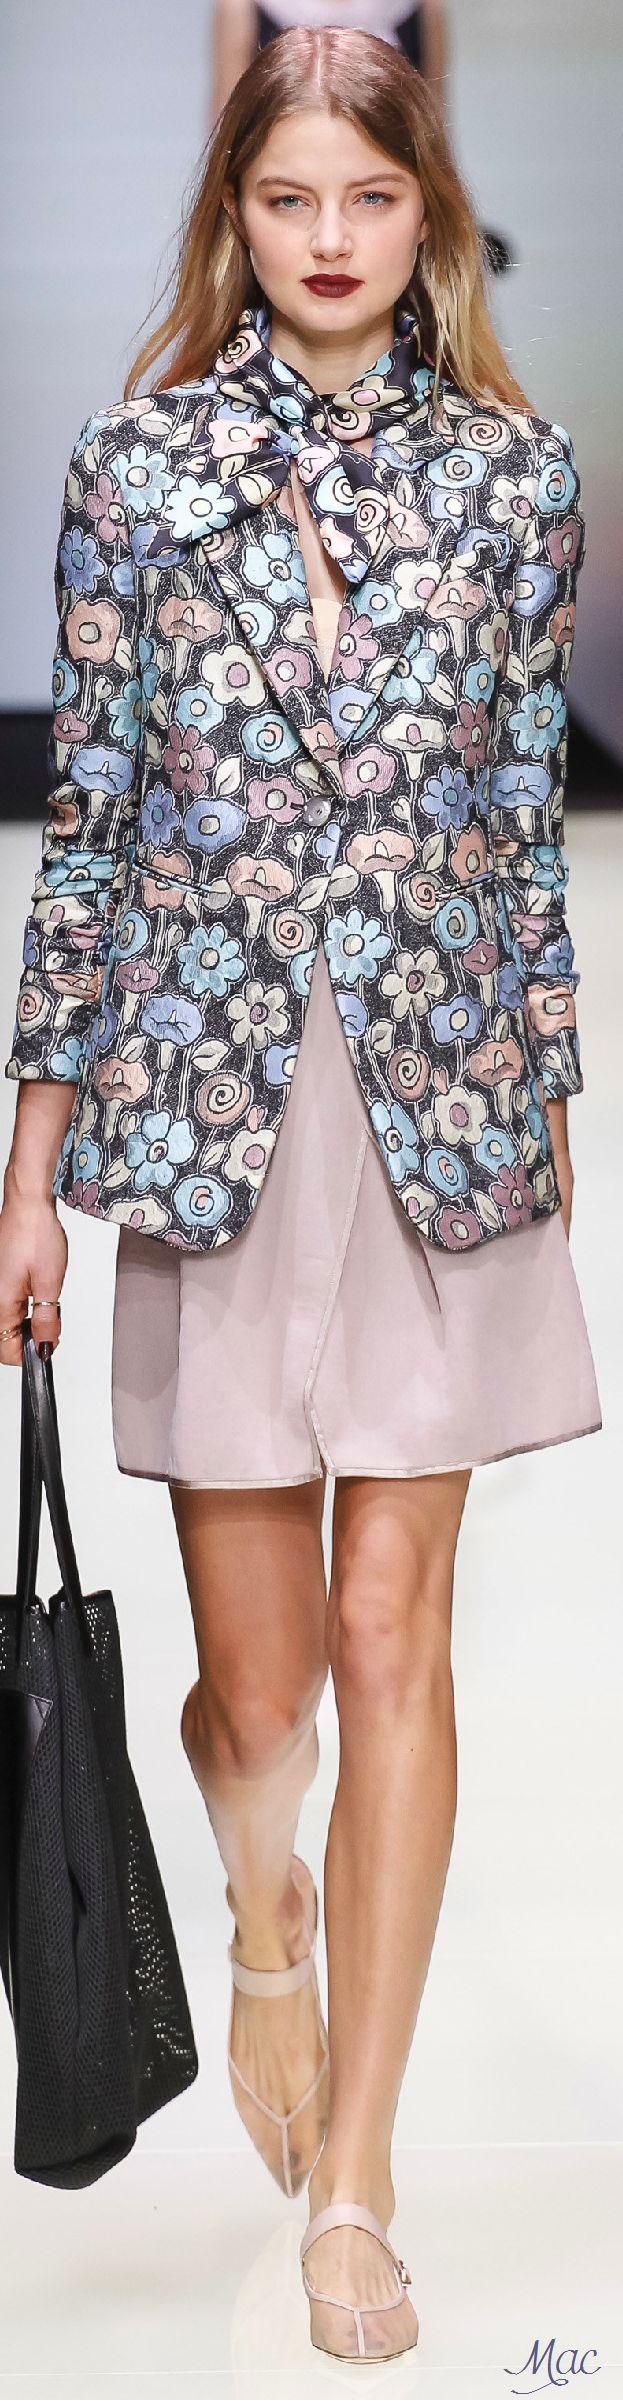 Spring 2016 Ready-to-Wear Emporio Armani